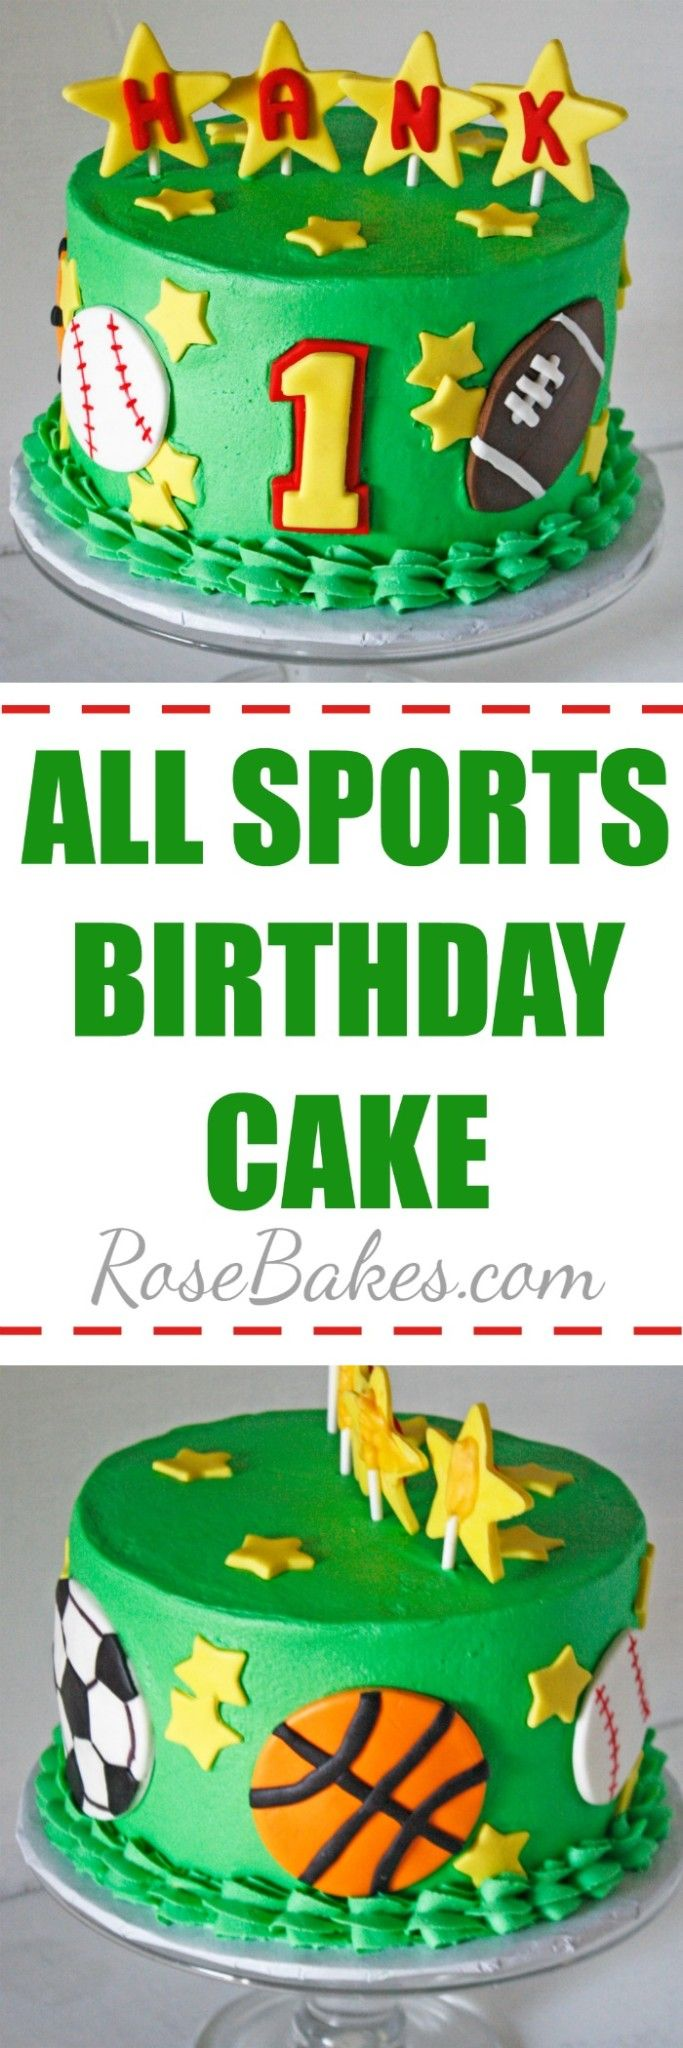 25 Best Ideas About Sport Cakes On Pinterest Baseball